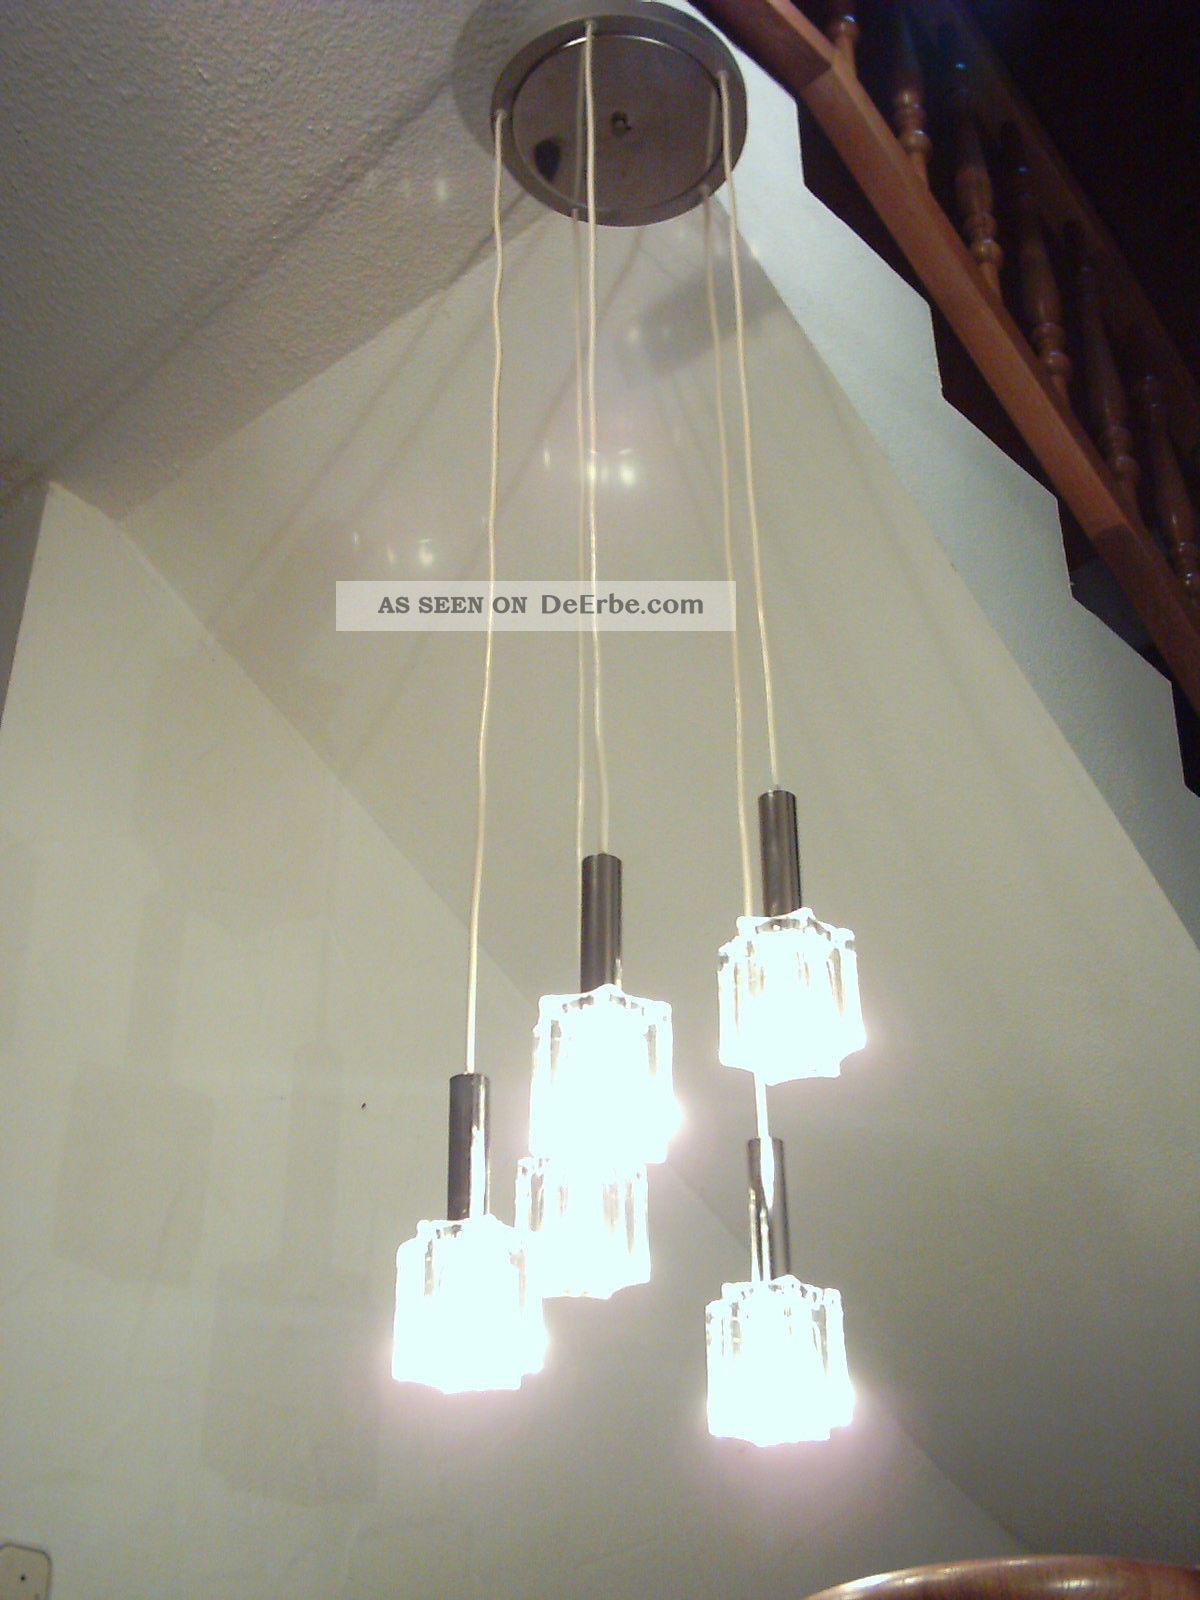 Kaskadenlampe Chrom Bubble Lamp 70 U0027 Er Jahre, Panton Eams Space Age Vintage  Lampe Bild